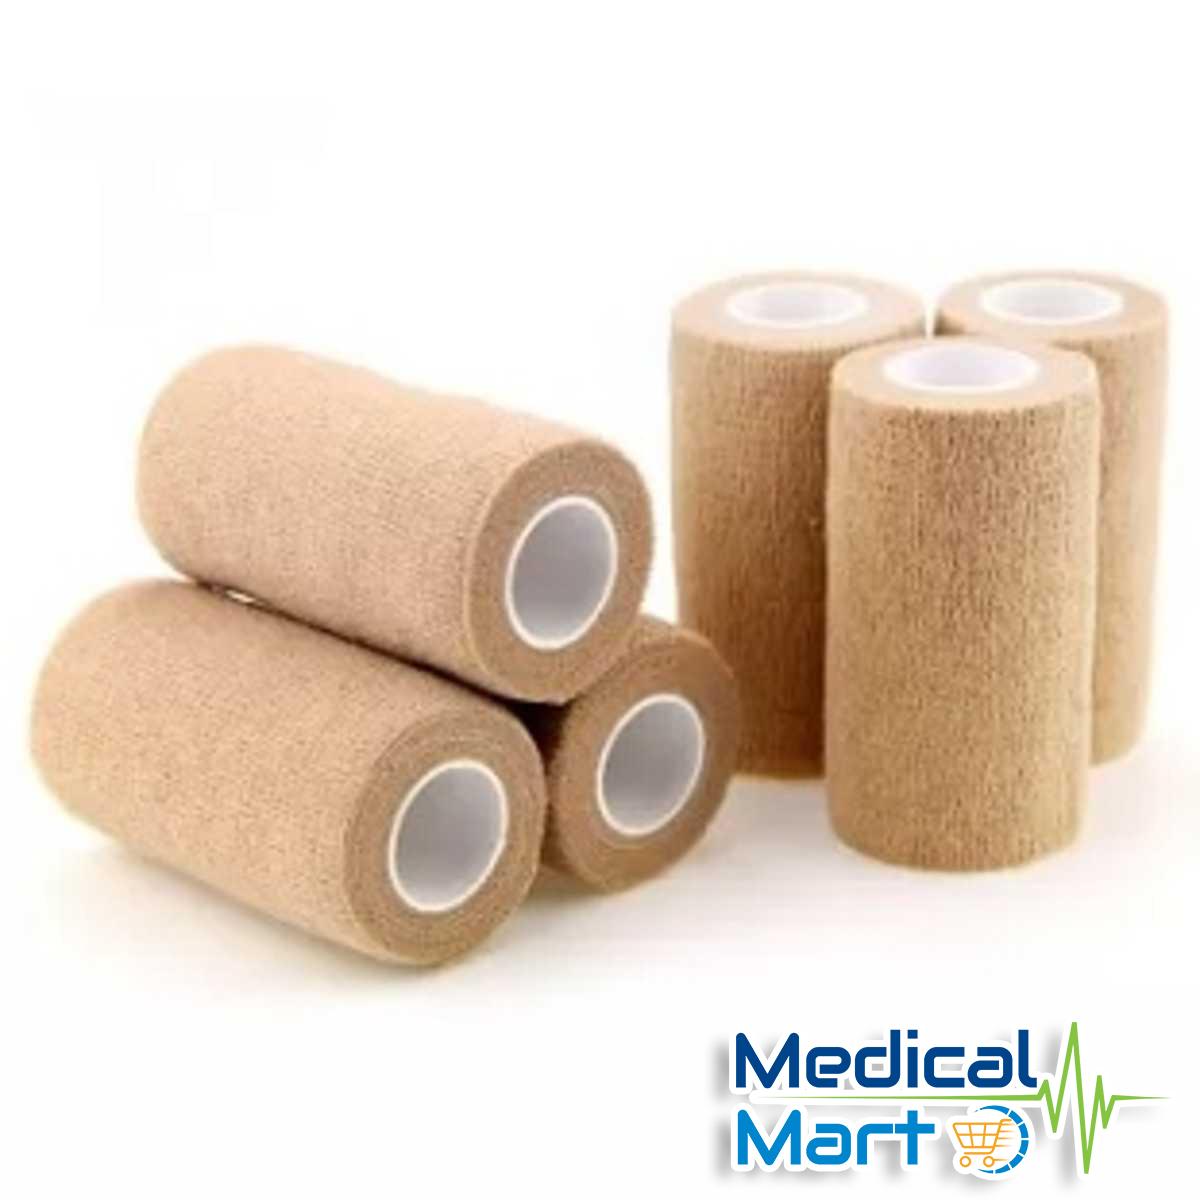 Cohesive Bandage, 10cm x 4.5cm